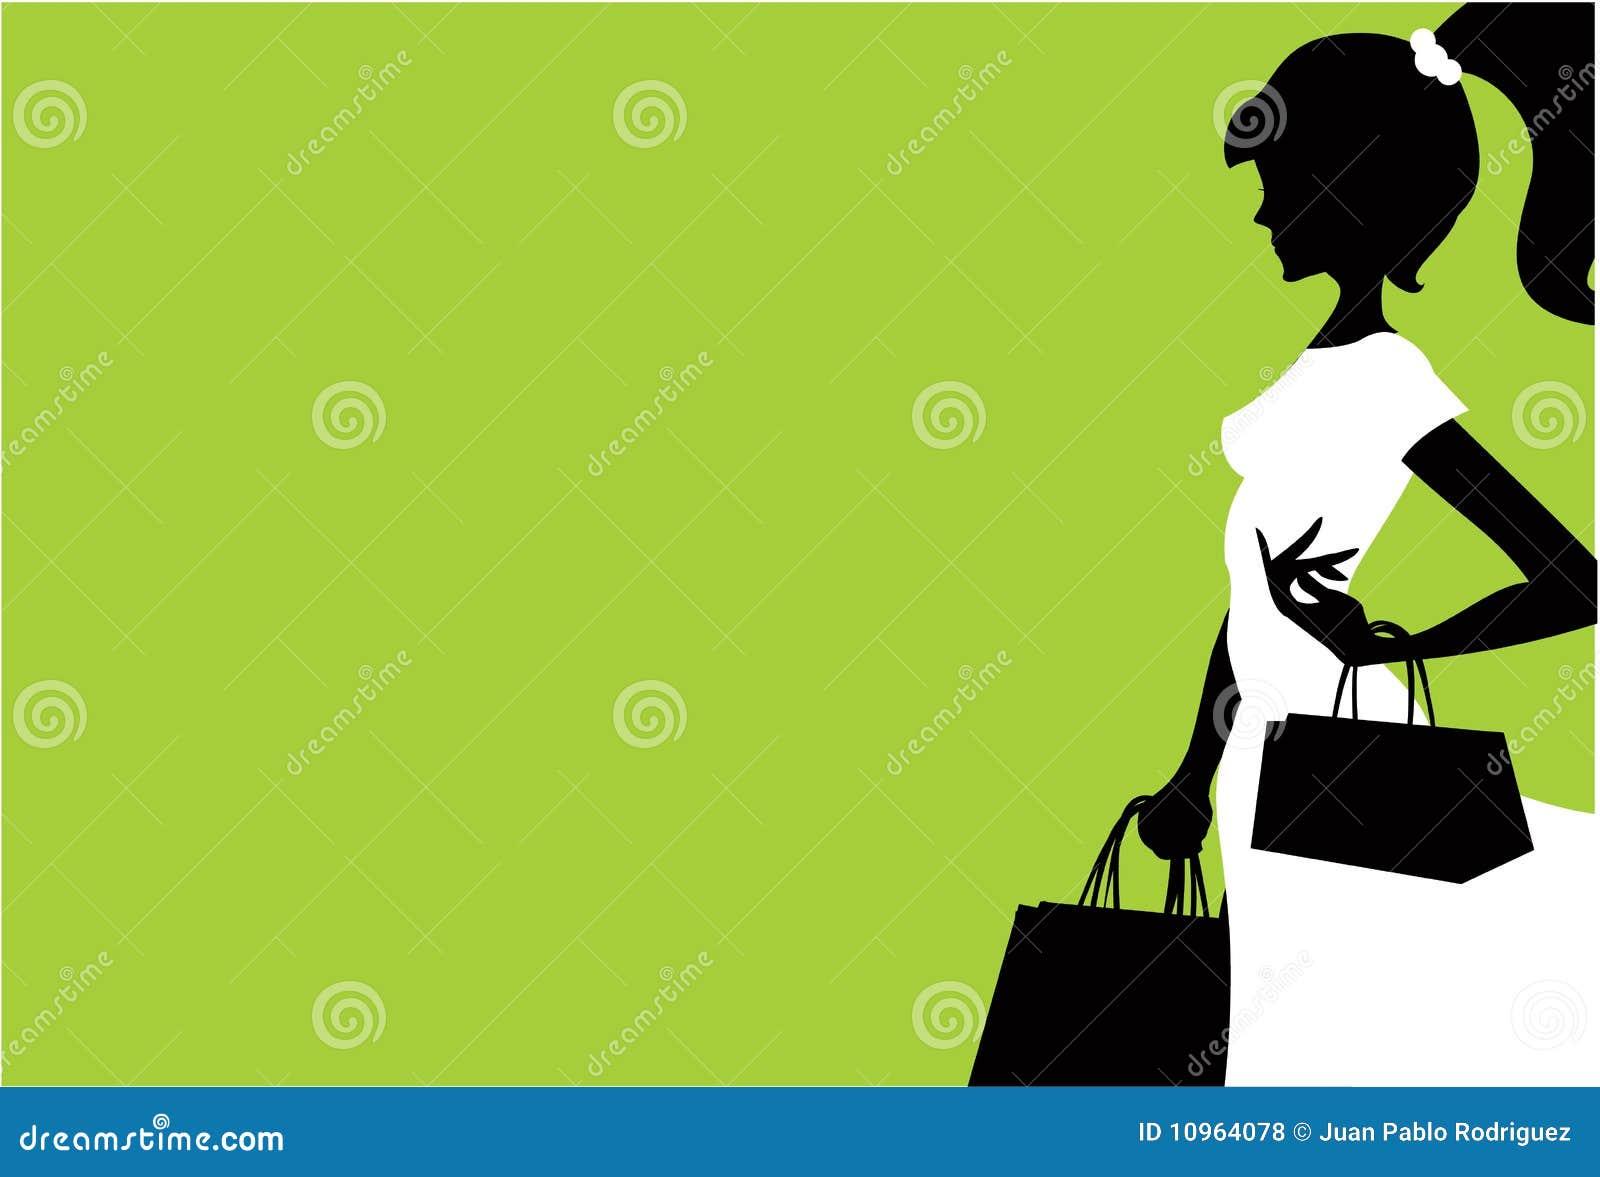 Royalty Free Stock Photos: Women shopping